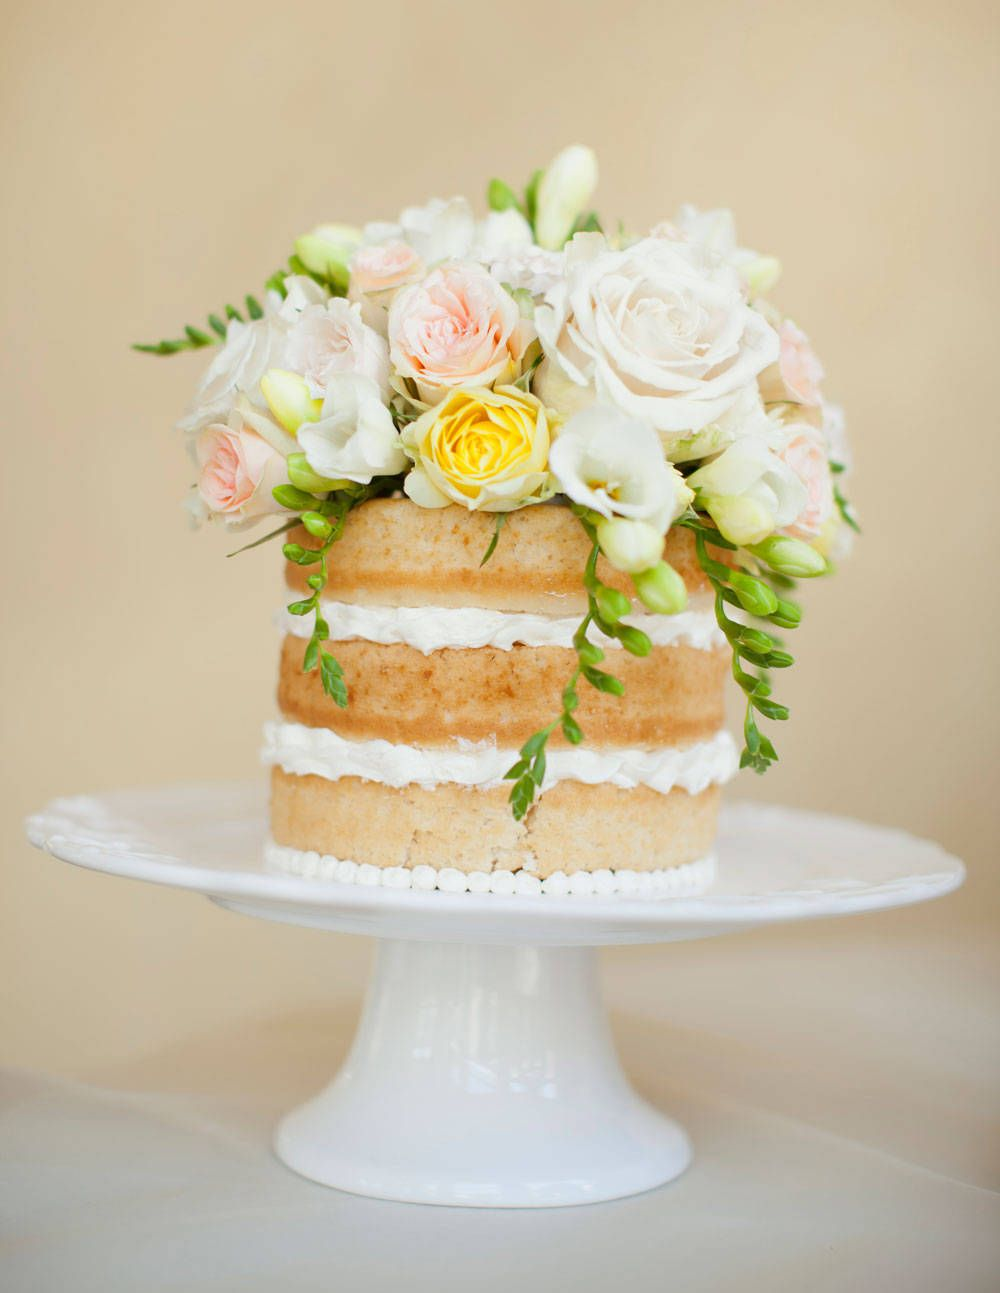 Wedding Cakes Without Fondant - Wedding Cakes Without Frosting